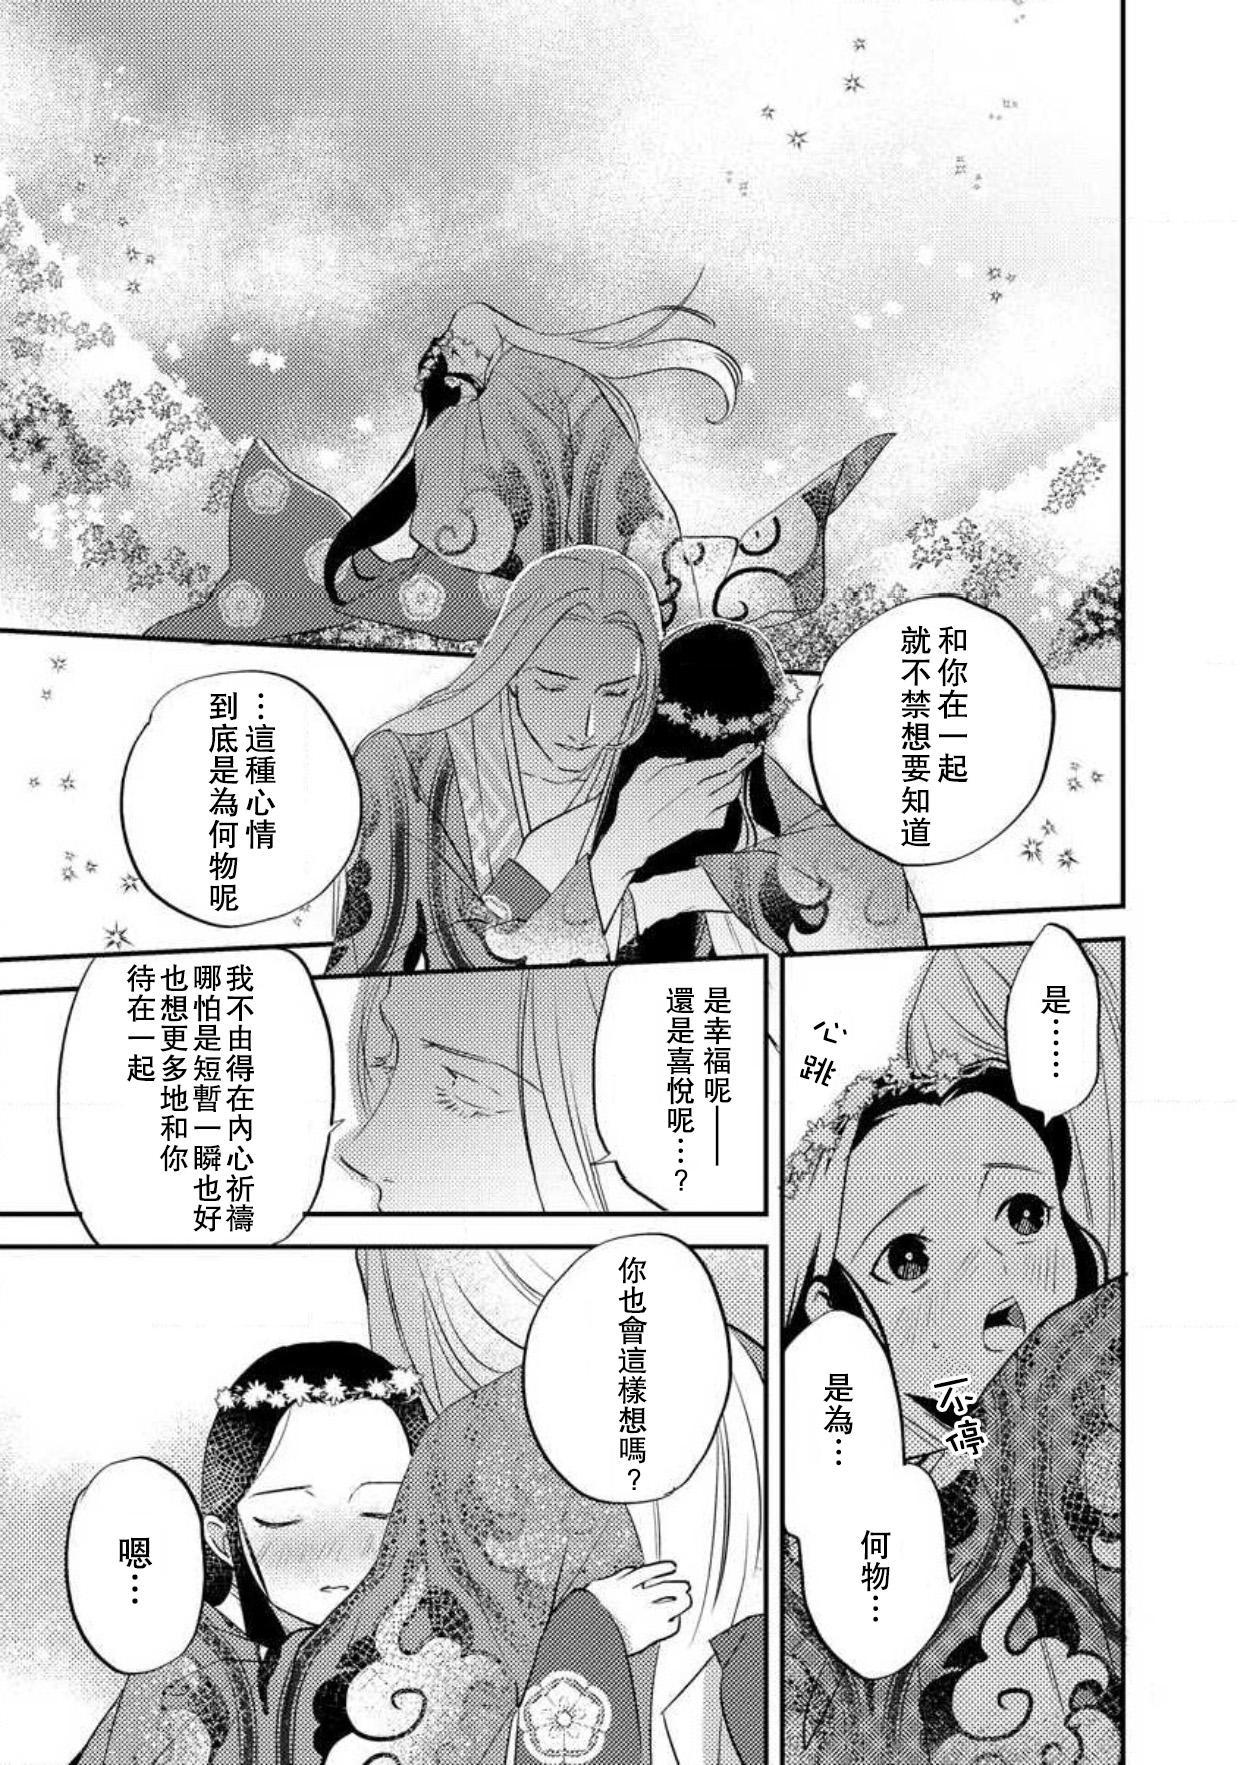 Oeyama suimutan utsukushiki oni no toraware hime | 大江山醉夢逸話 美麗的鬼與被囚禁的公主 Ch. 1-8 194